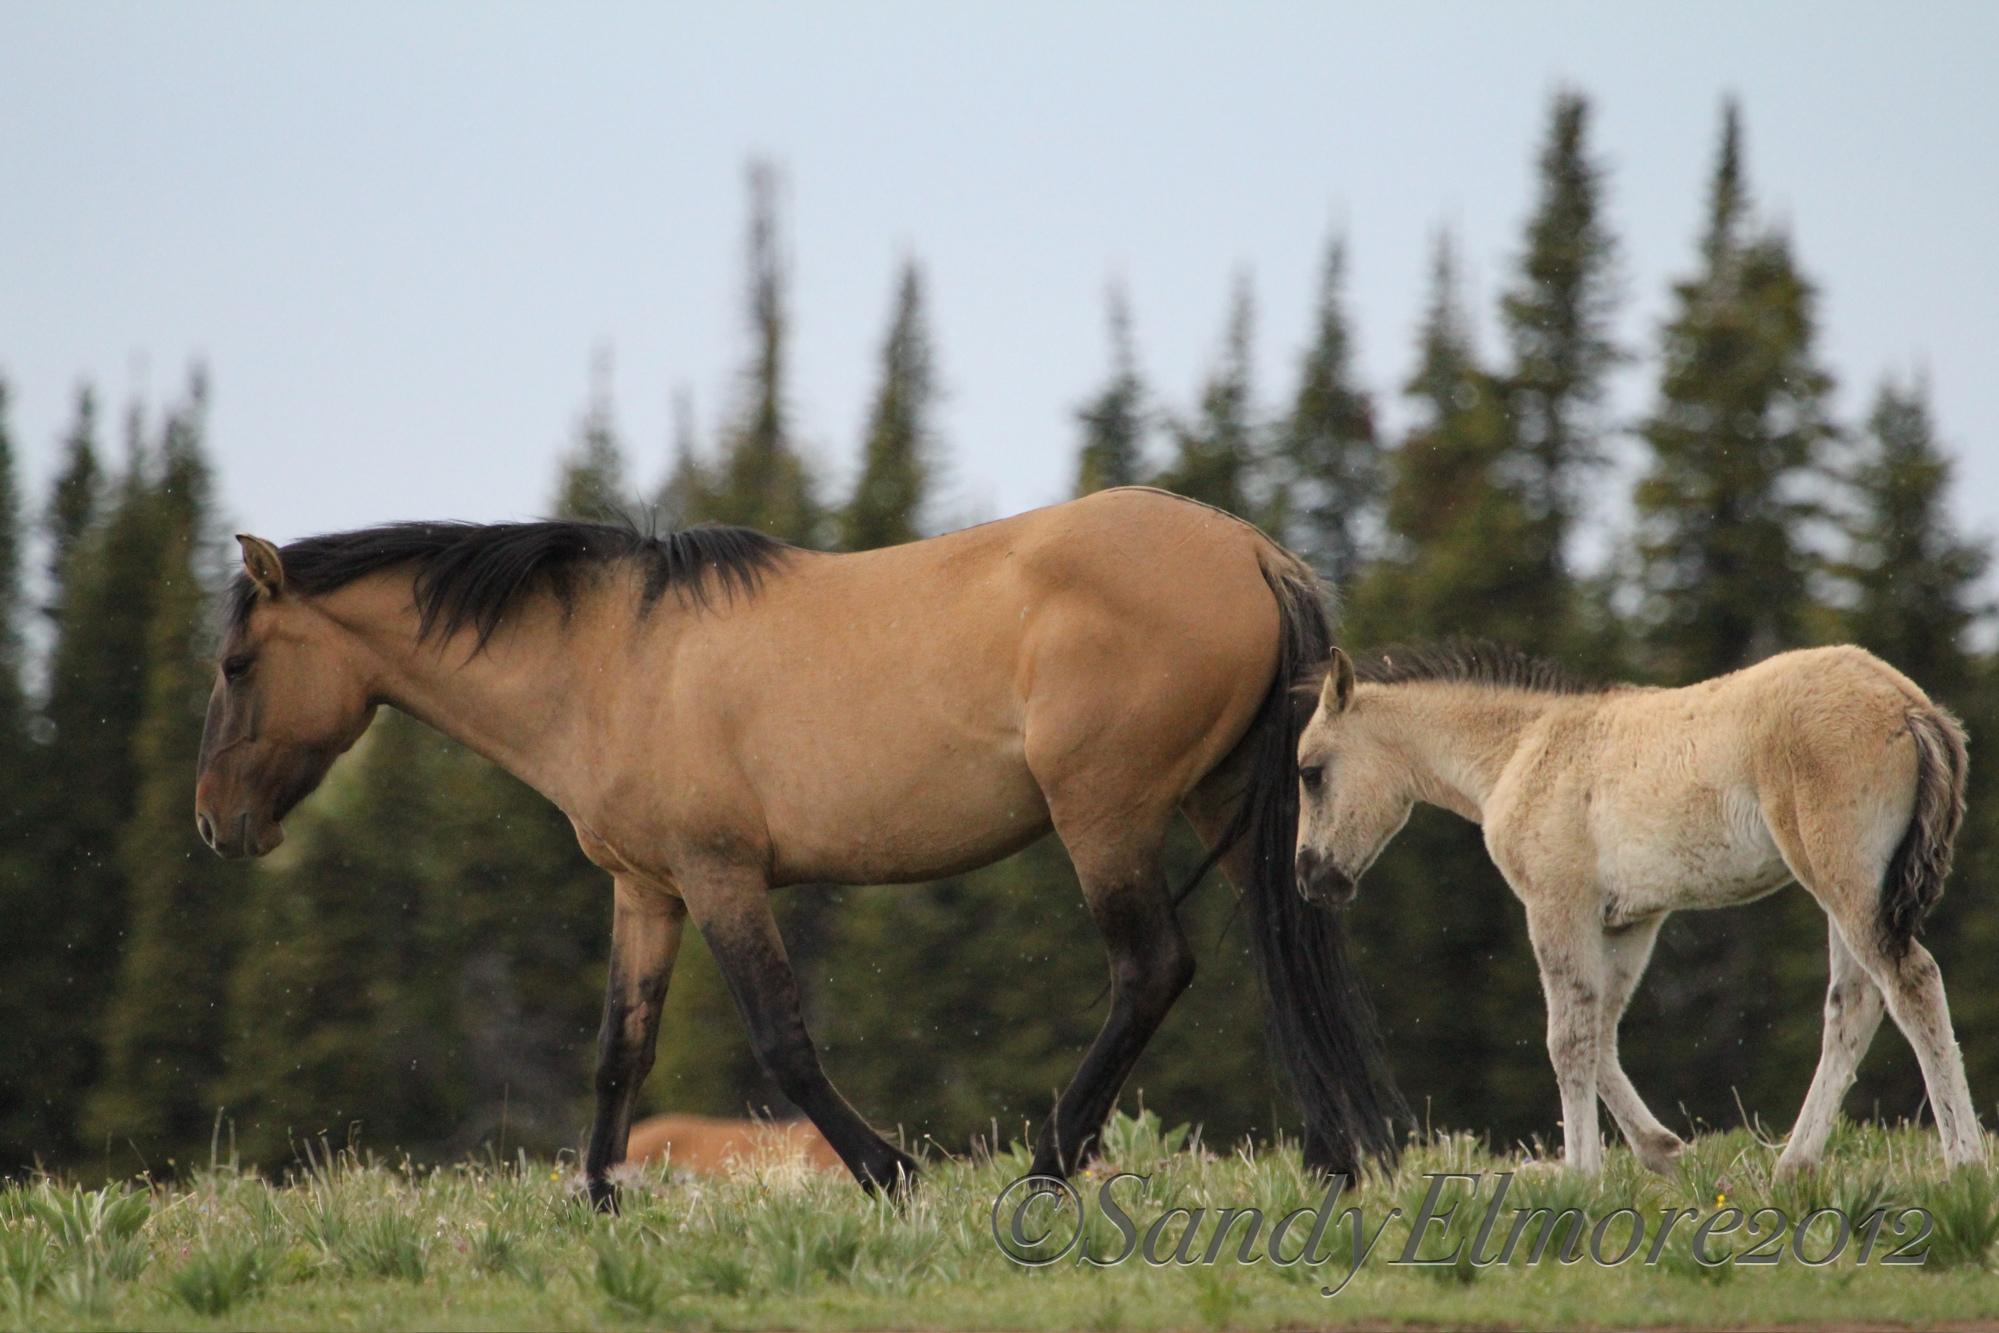 Juneau and Mendenhall, June 17, 2012